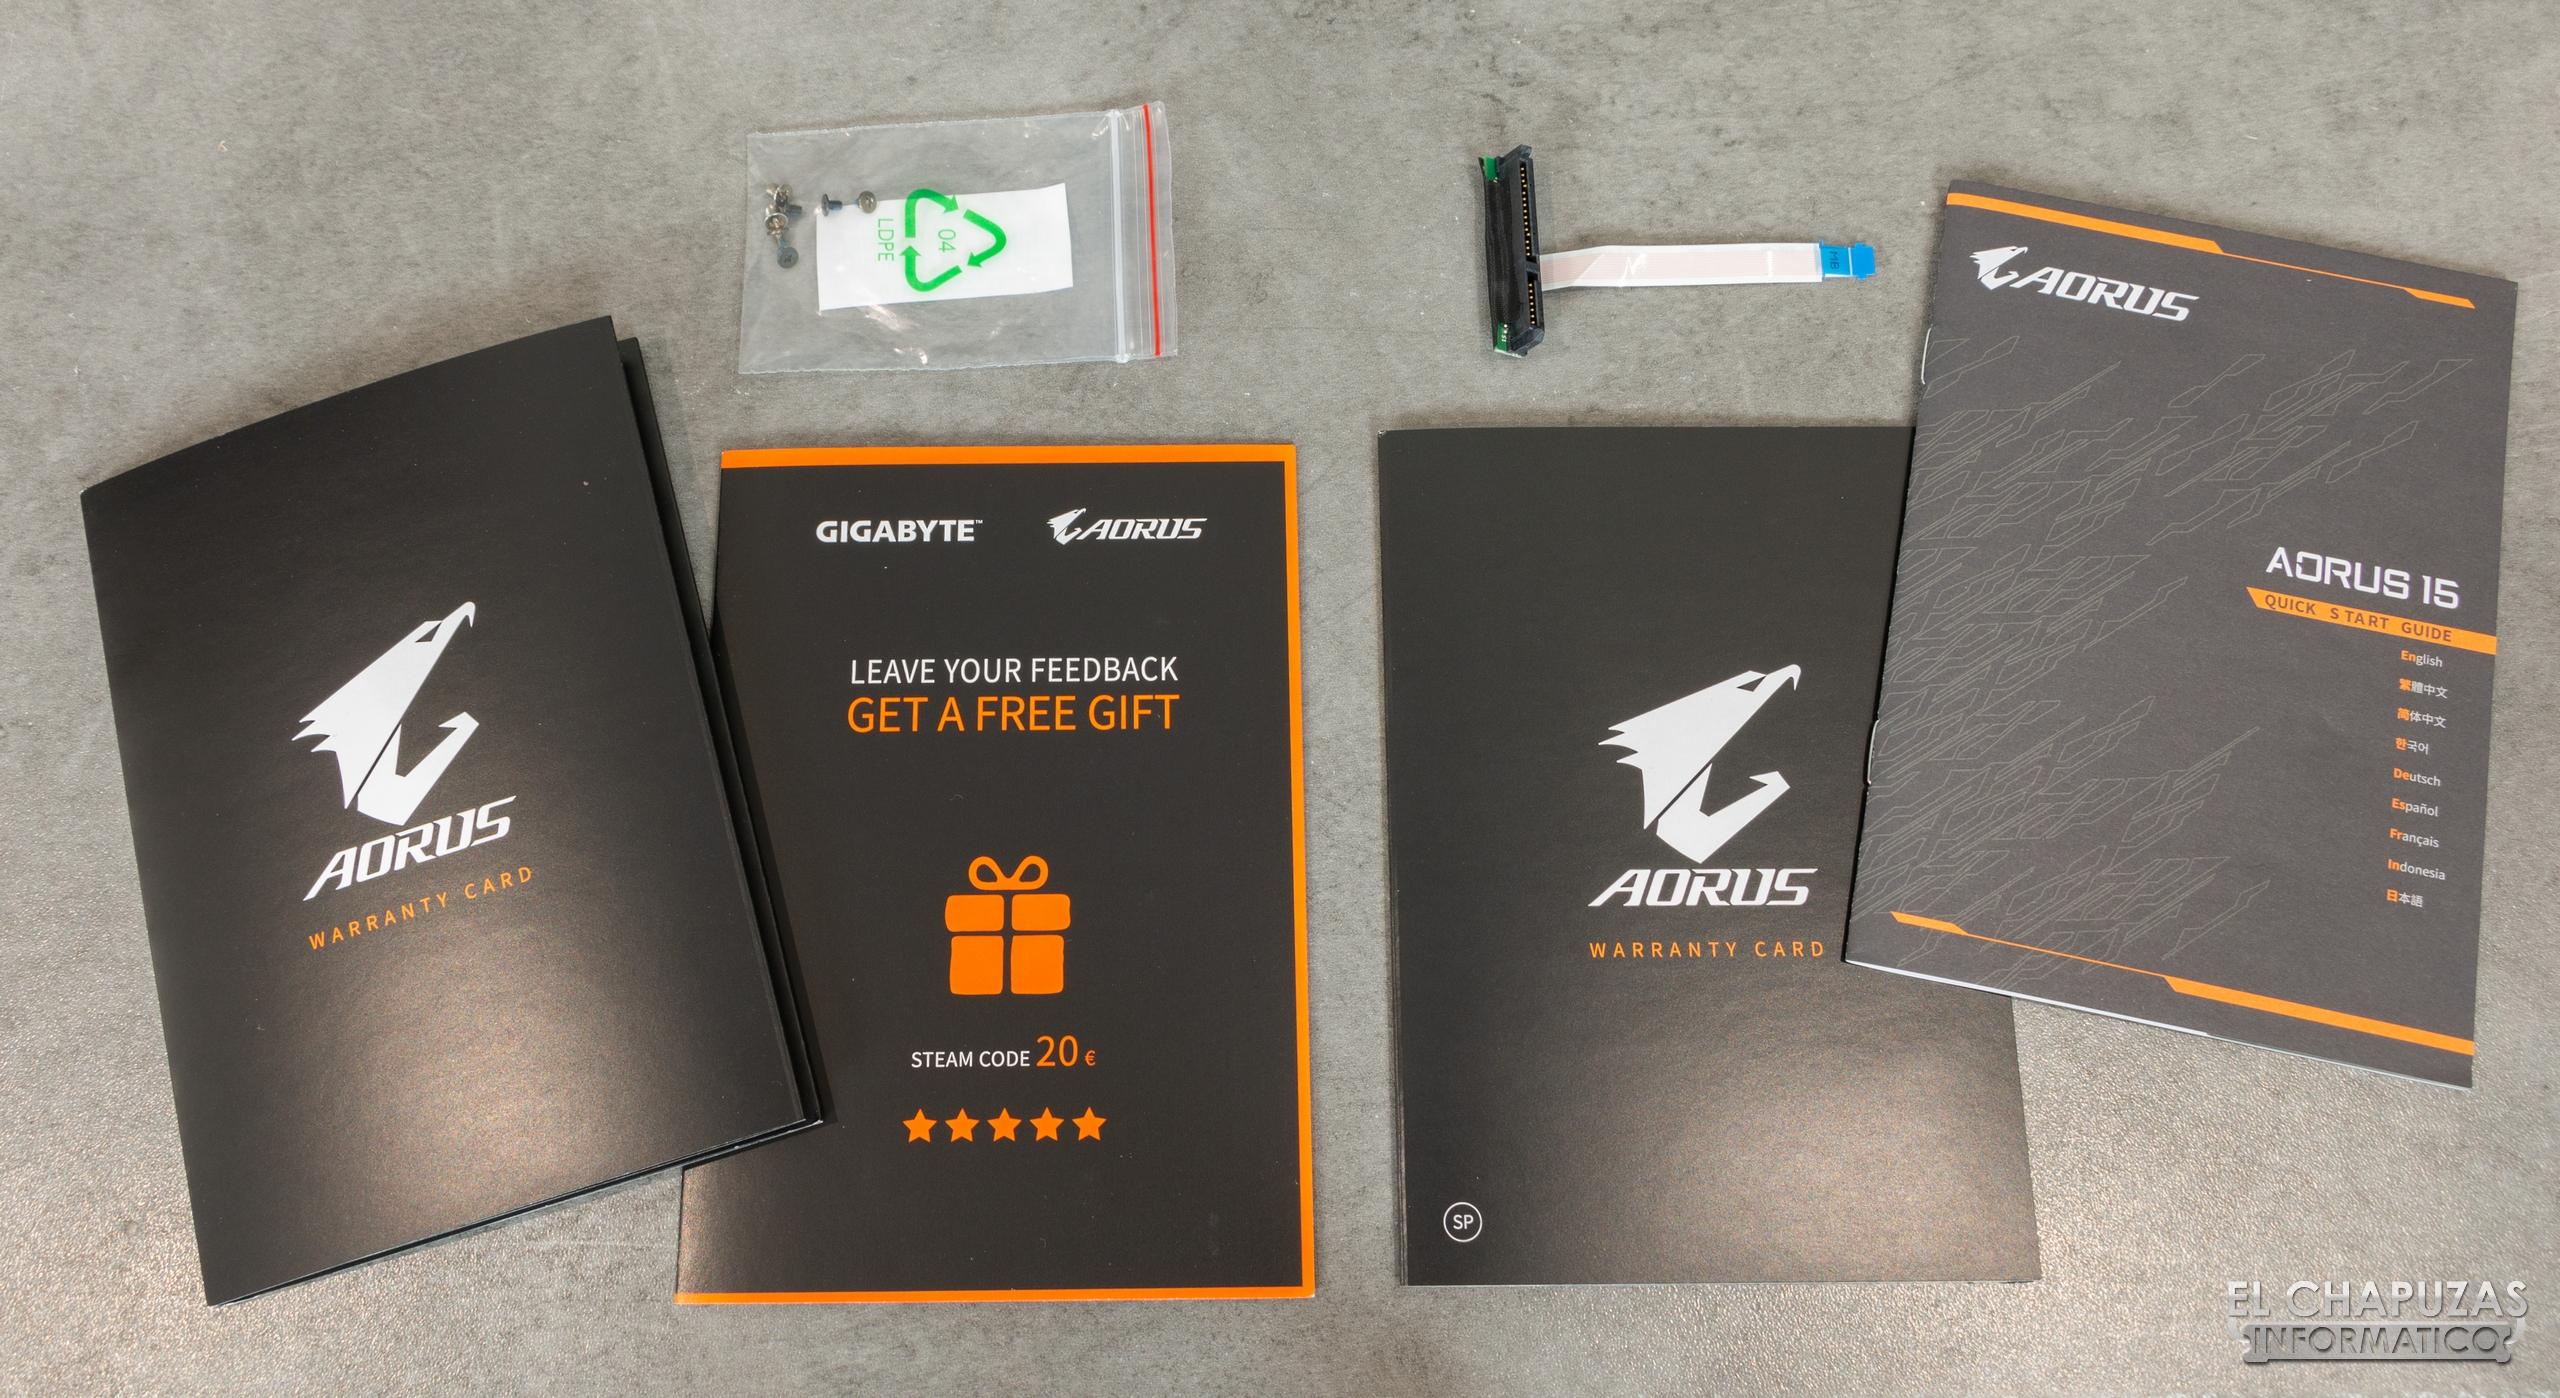 Review: Gigabyte Aorus 15-SA (i7-9750H + GTX 1660 Ti)